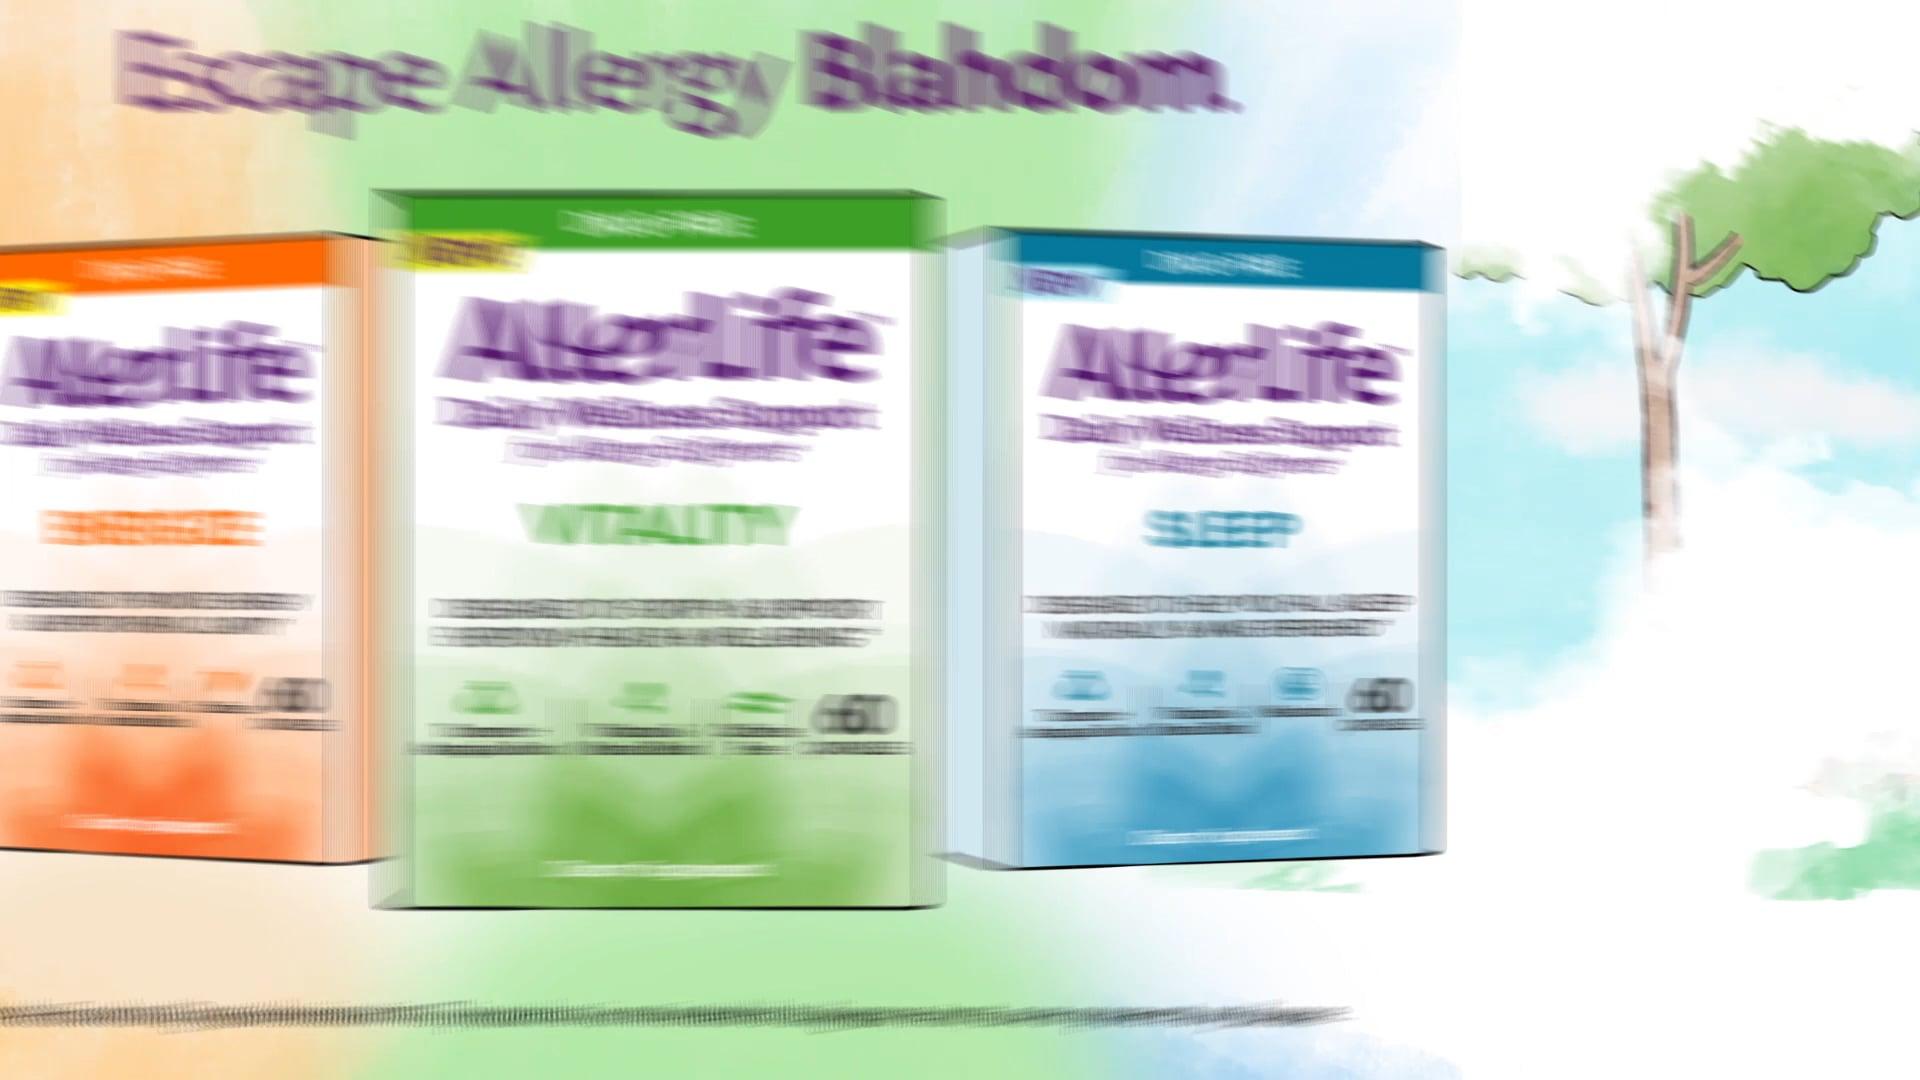 AllerLife